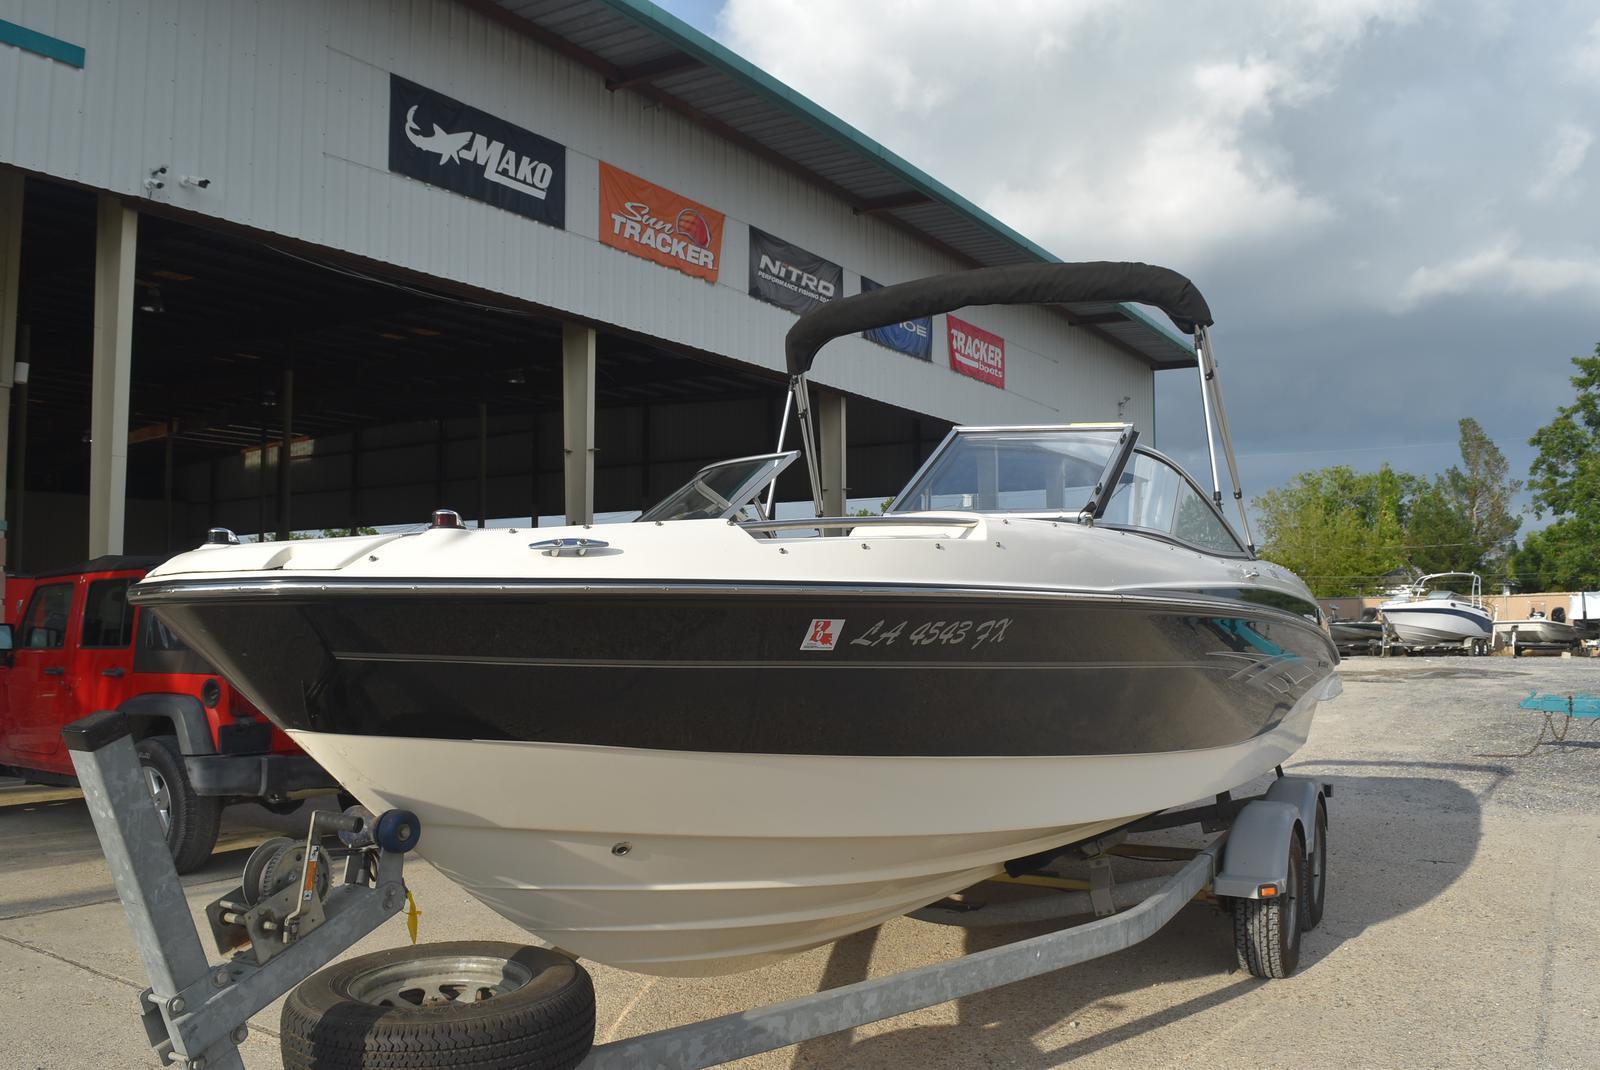 2010 Bayliner boat for sale, model of the boat is 235BR & Image # 39 of 43